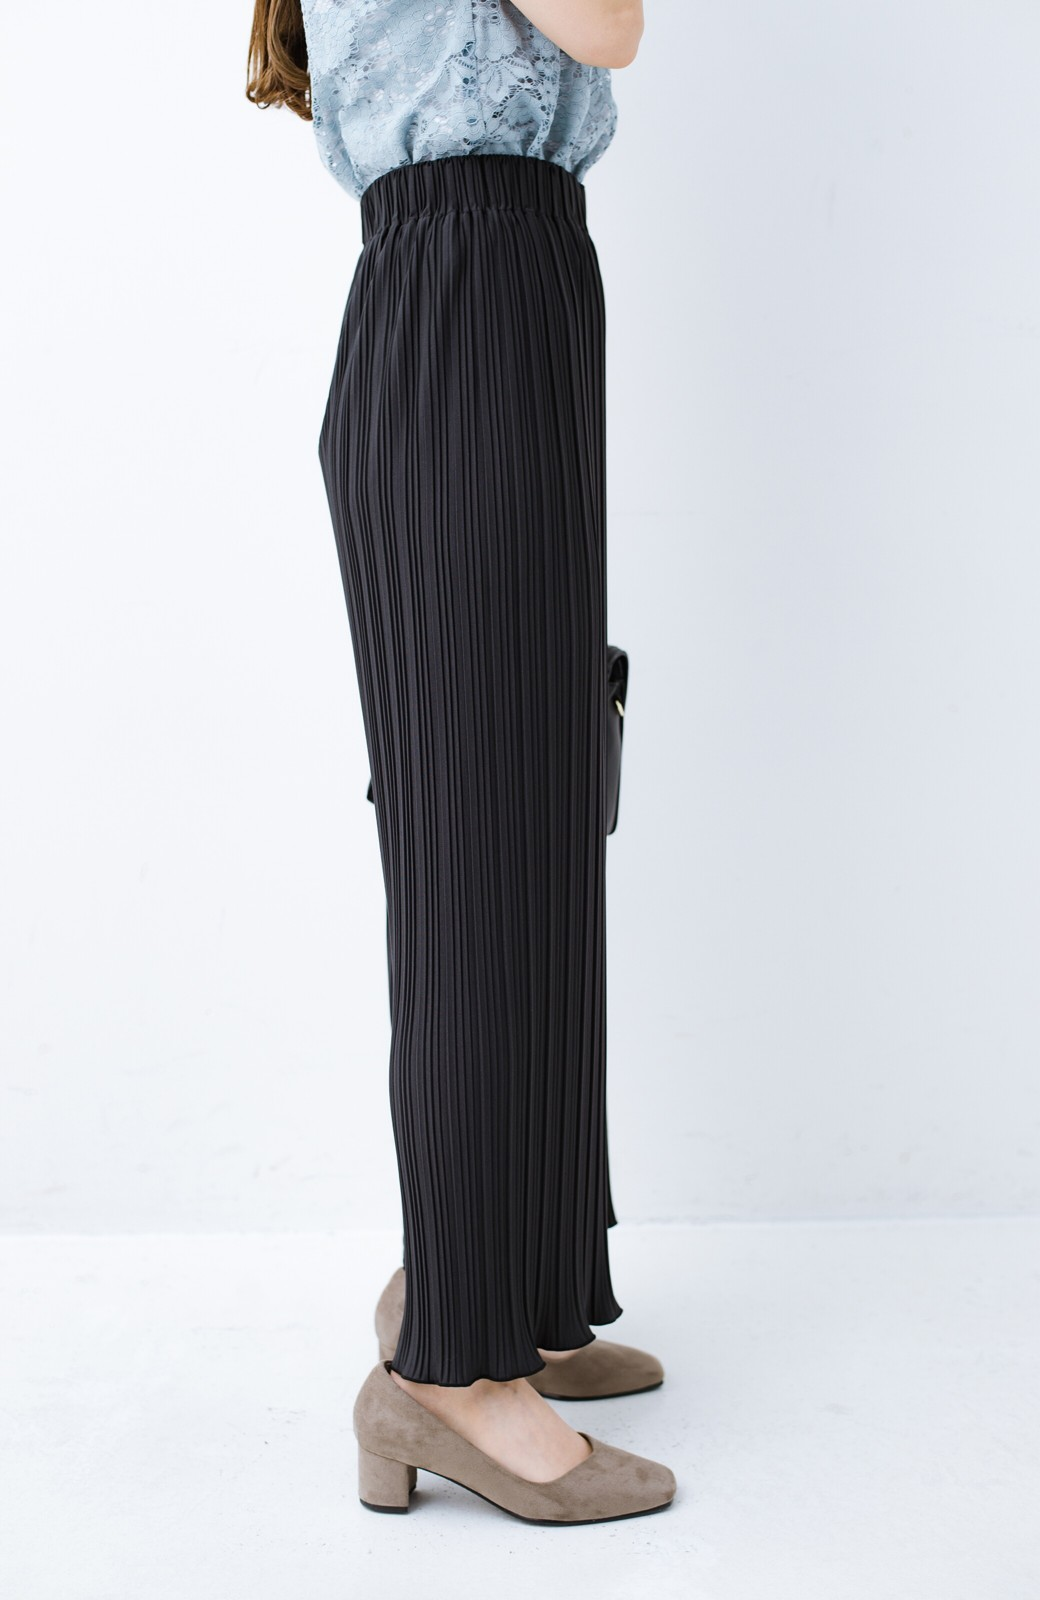 haco! パンツ派さんのデートにもカジュアル派さんの重ね着にも便利なプリーツパンツ  <チャコールグレー>の商品写真6